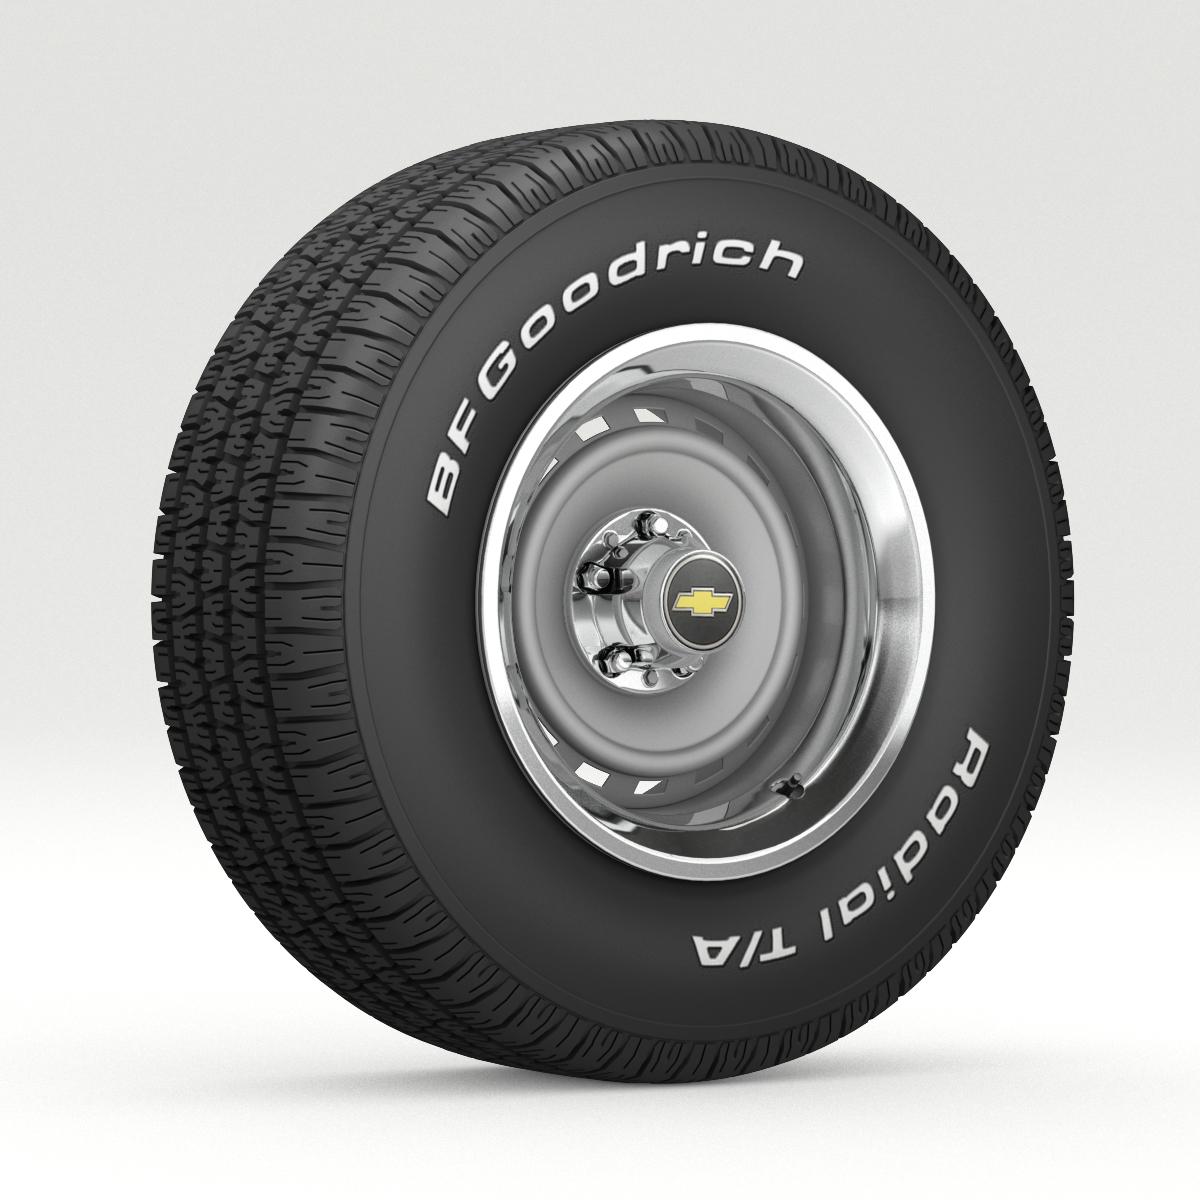 Vintage Chevrolet wheel and tire 8 3d model 3ds max fbx obj 272921